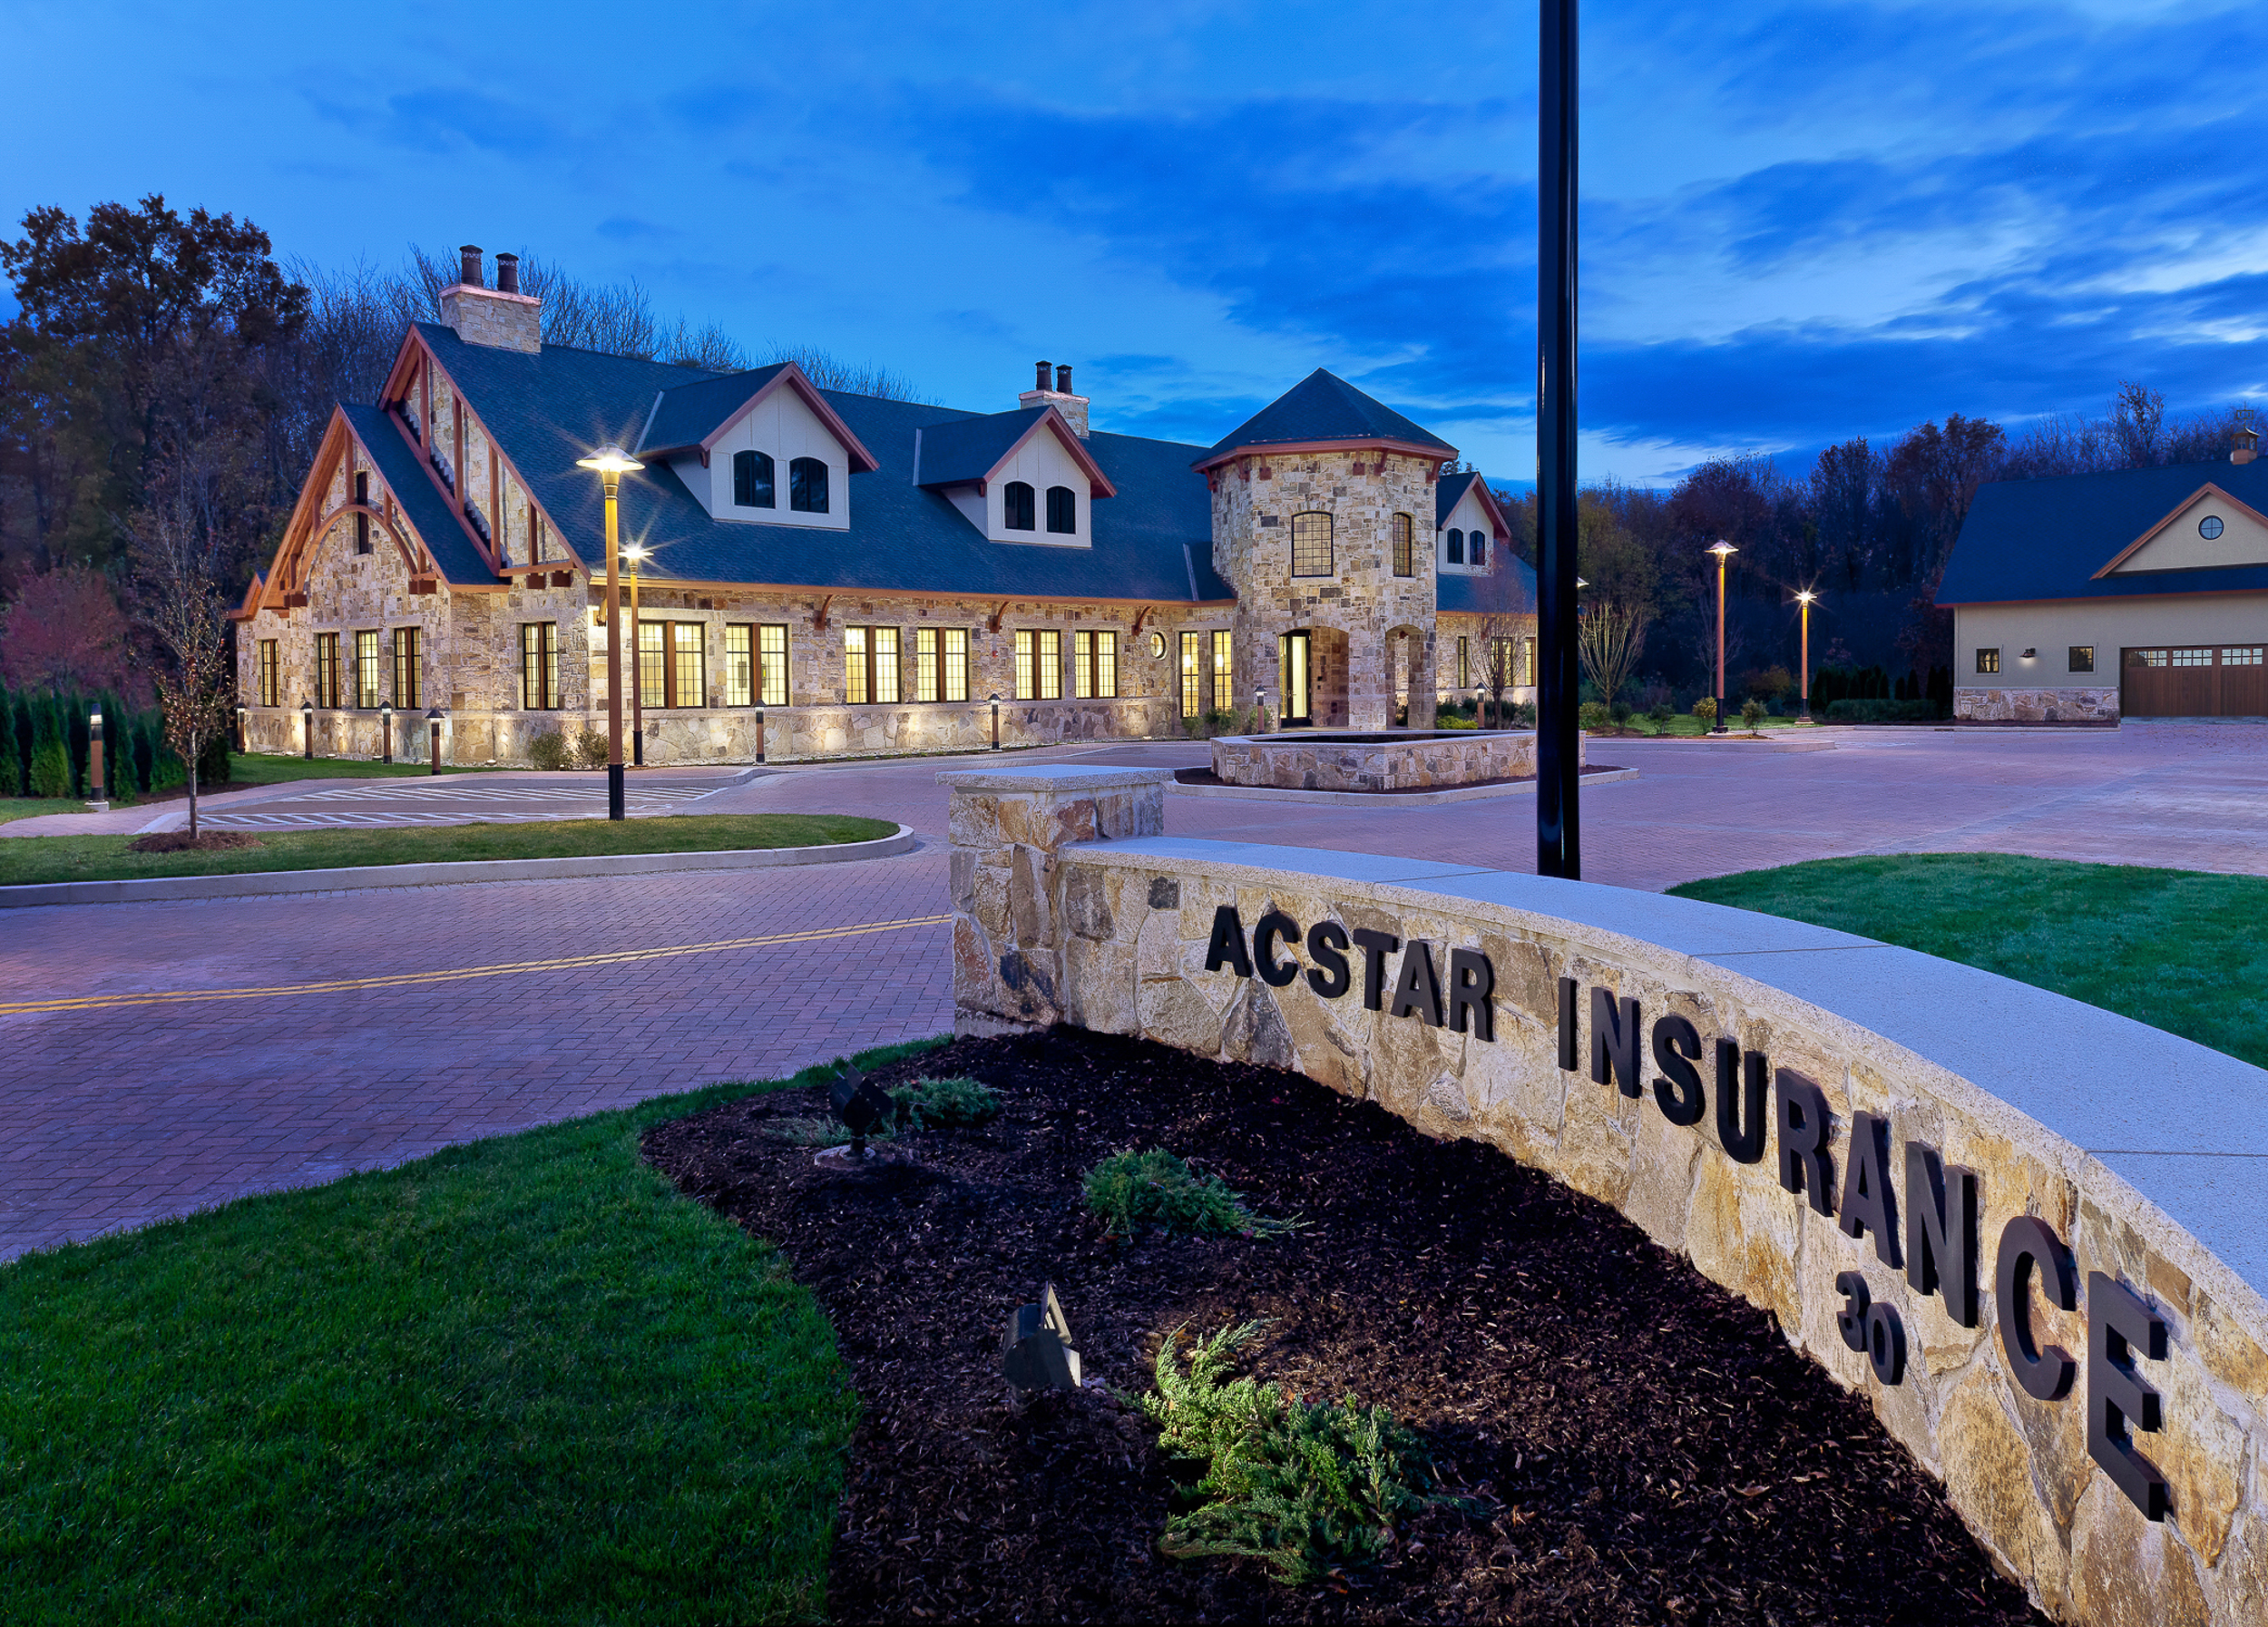 Acstar Insurance HQ, Farmington, CT. Architectural design by Quisenberry Arcari Malik Architects.